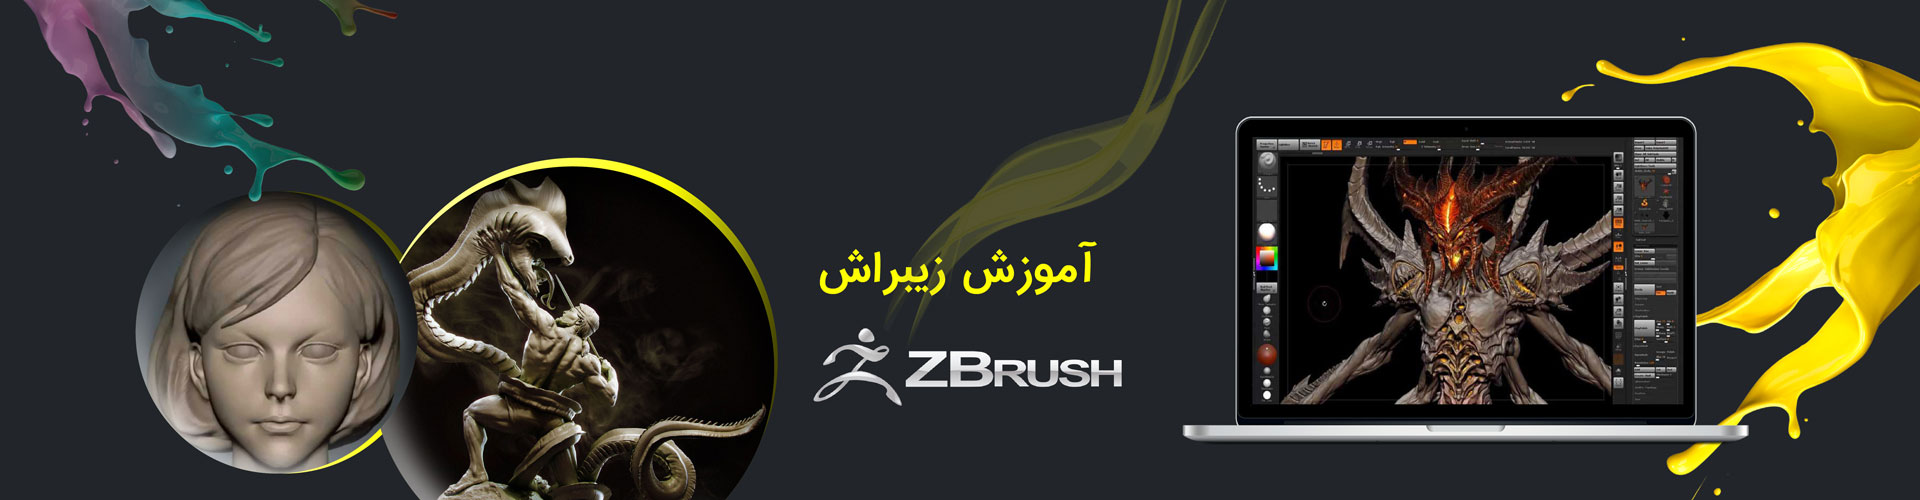 z brush 1 - آموزش زیبراش ، zbrush